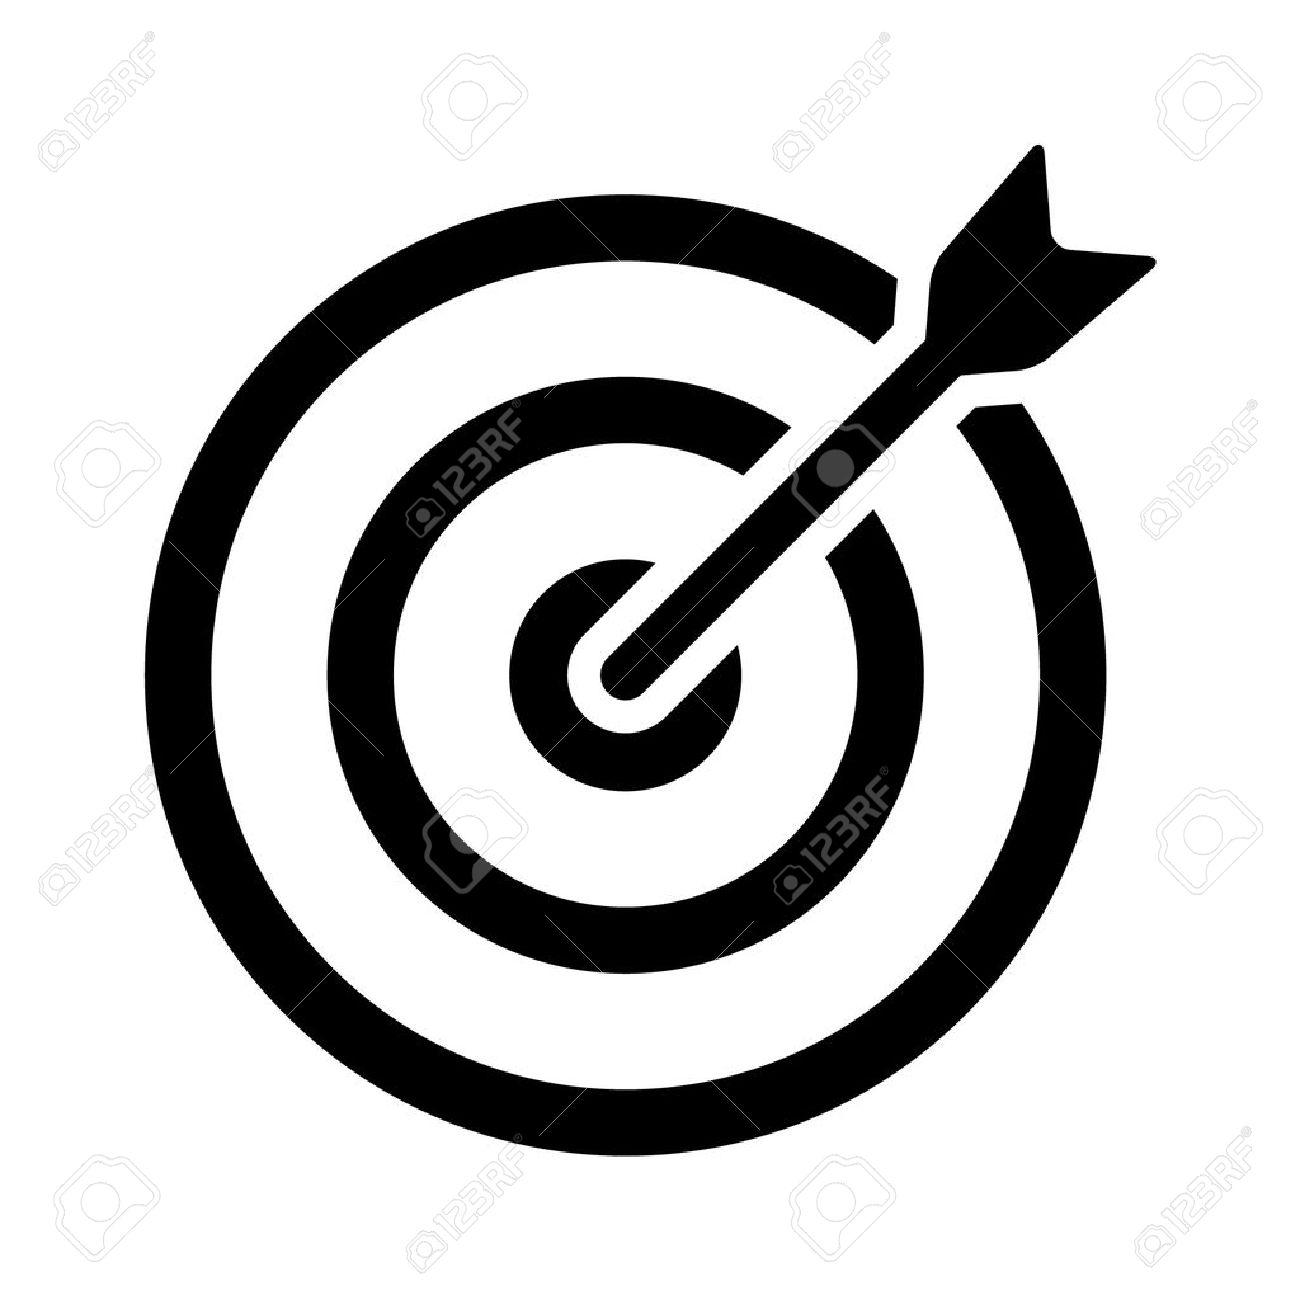 banner download Bullseye clipart clip art. Free download best on